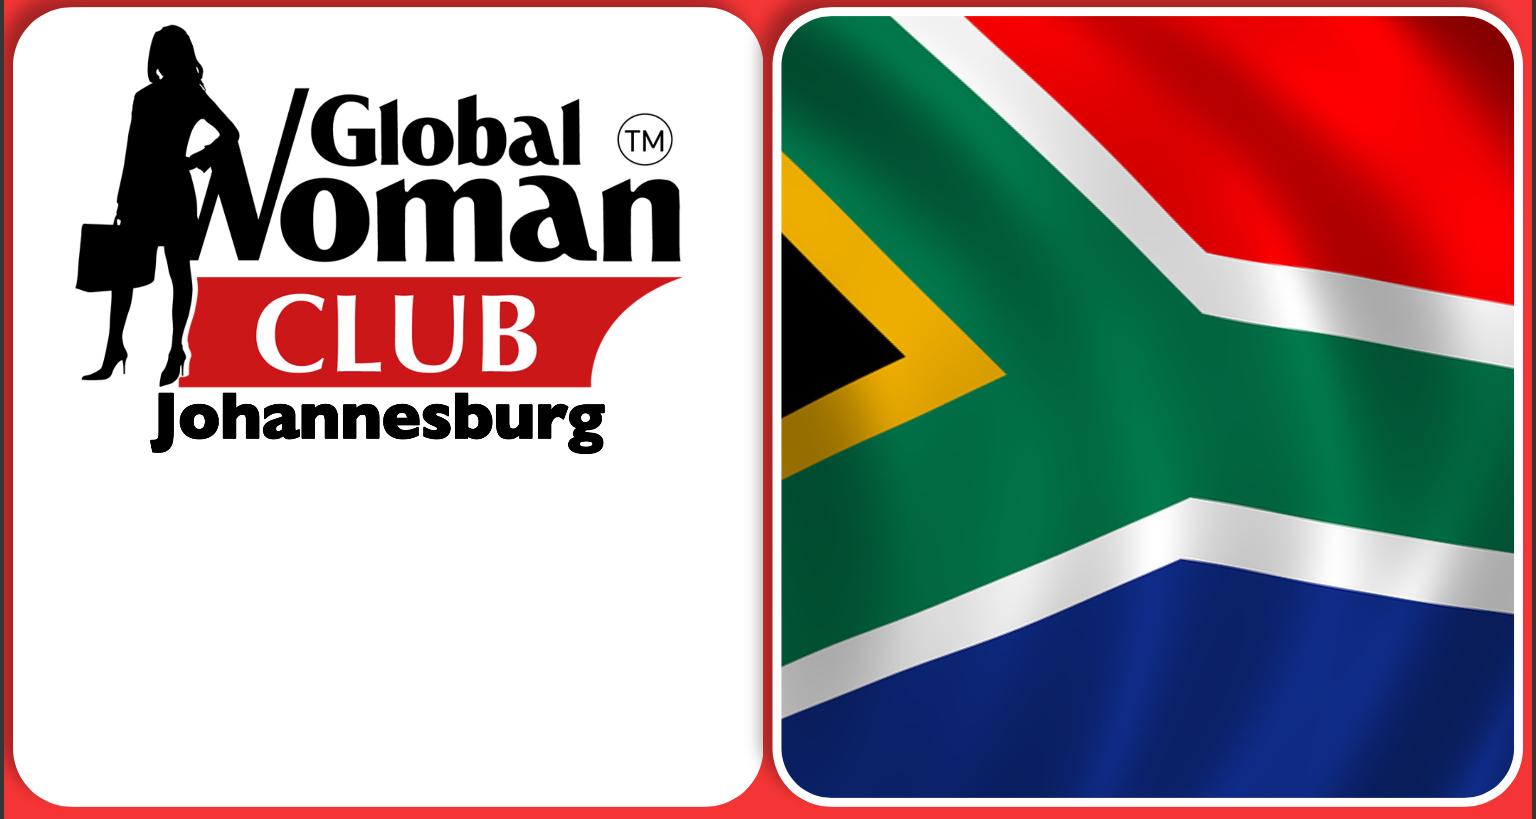 GLOBAL WOMAN CLUB JOHANNESBURG: BUSINESS NETWORKING MEETING - July